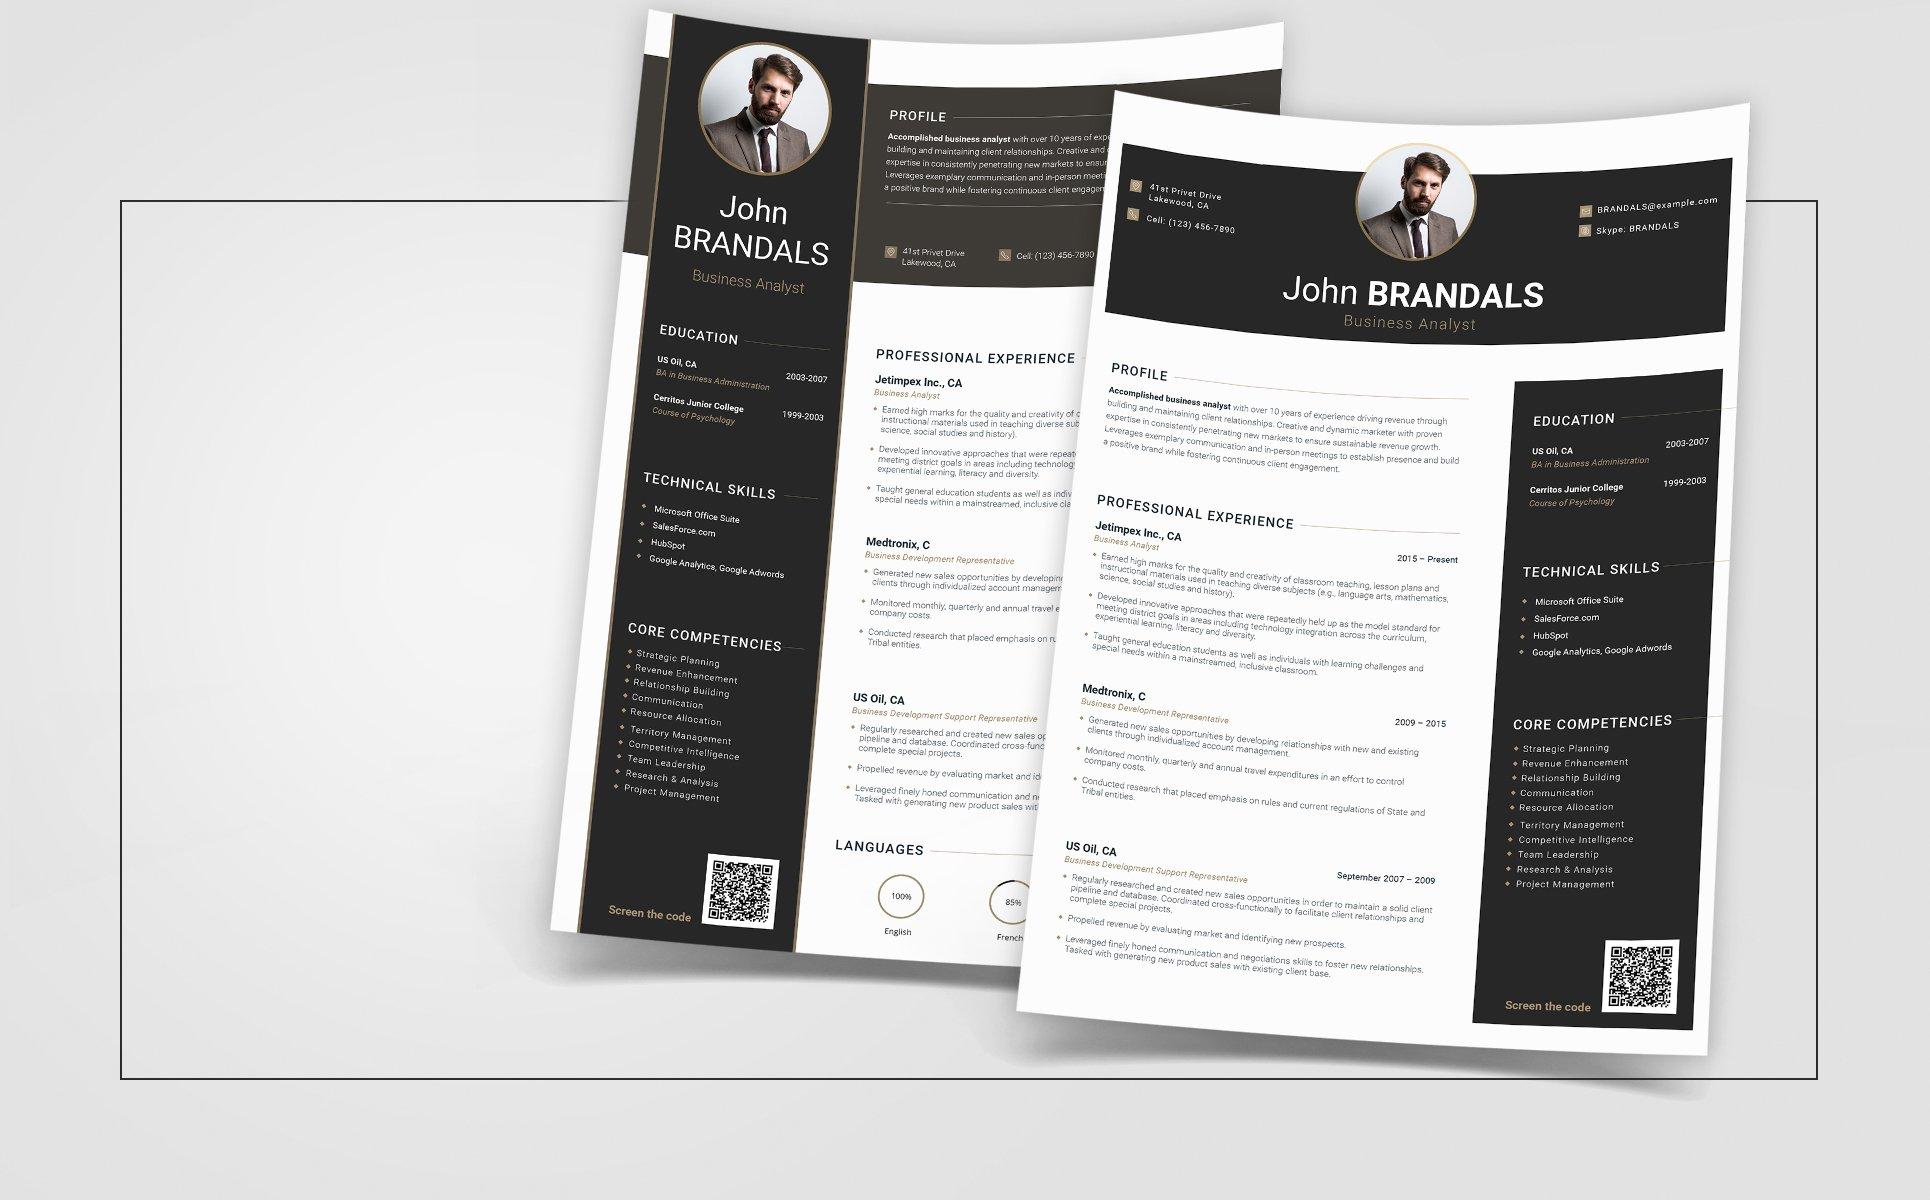 John Brandals - Business Analyst Resume Template #66444